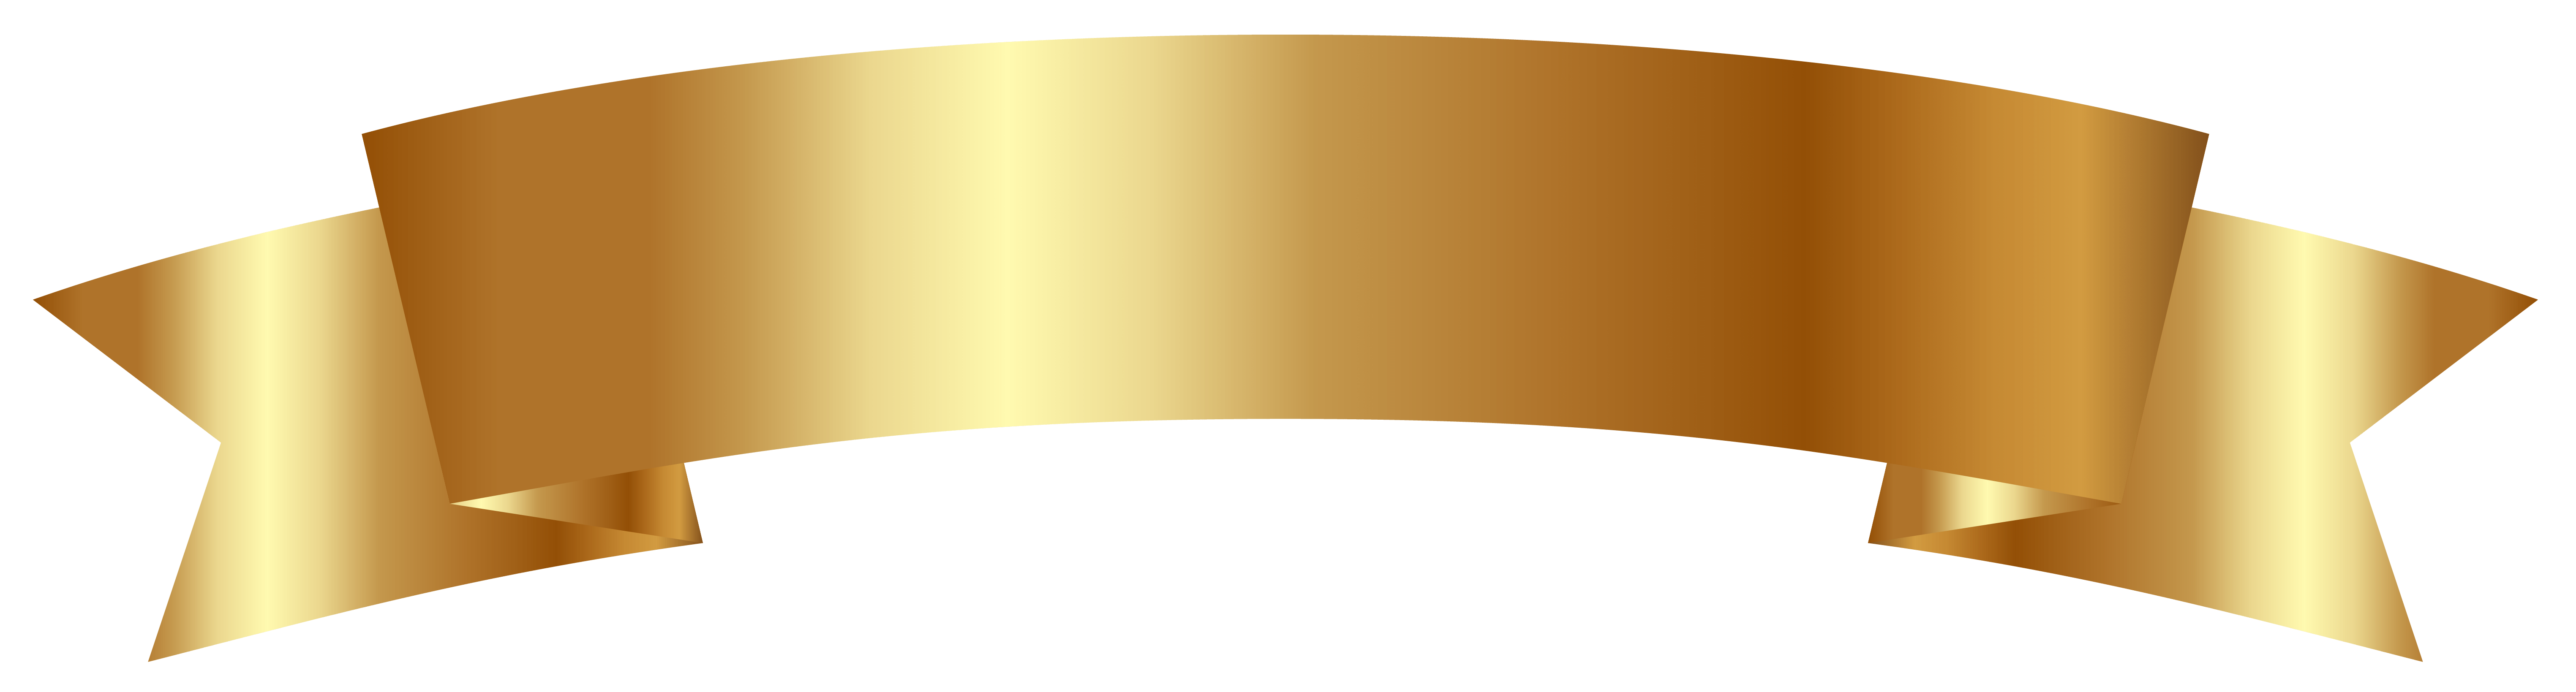 Gold banner clipart » Clipart Portal.